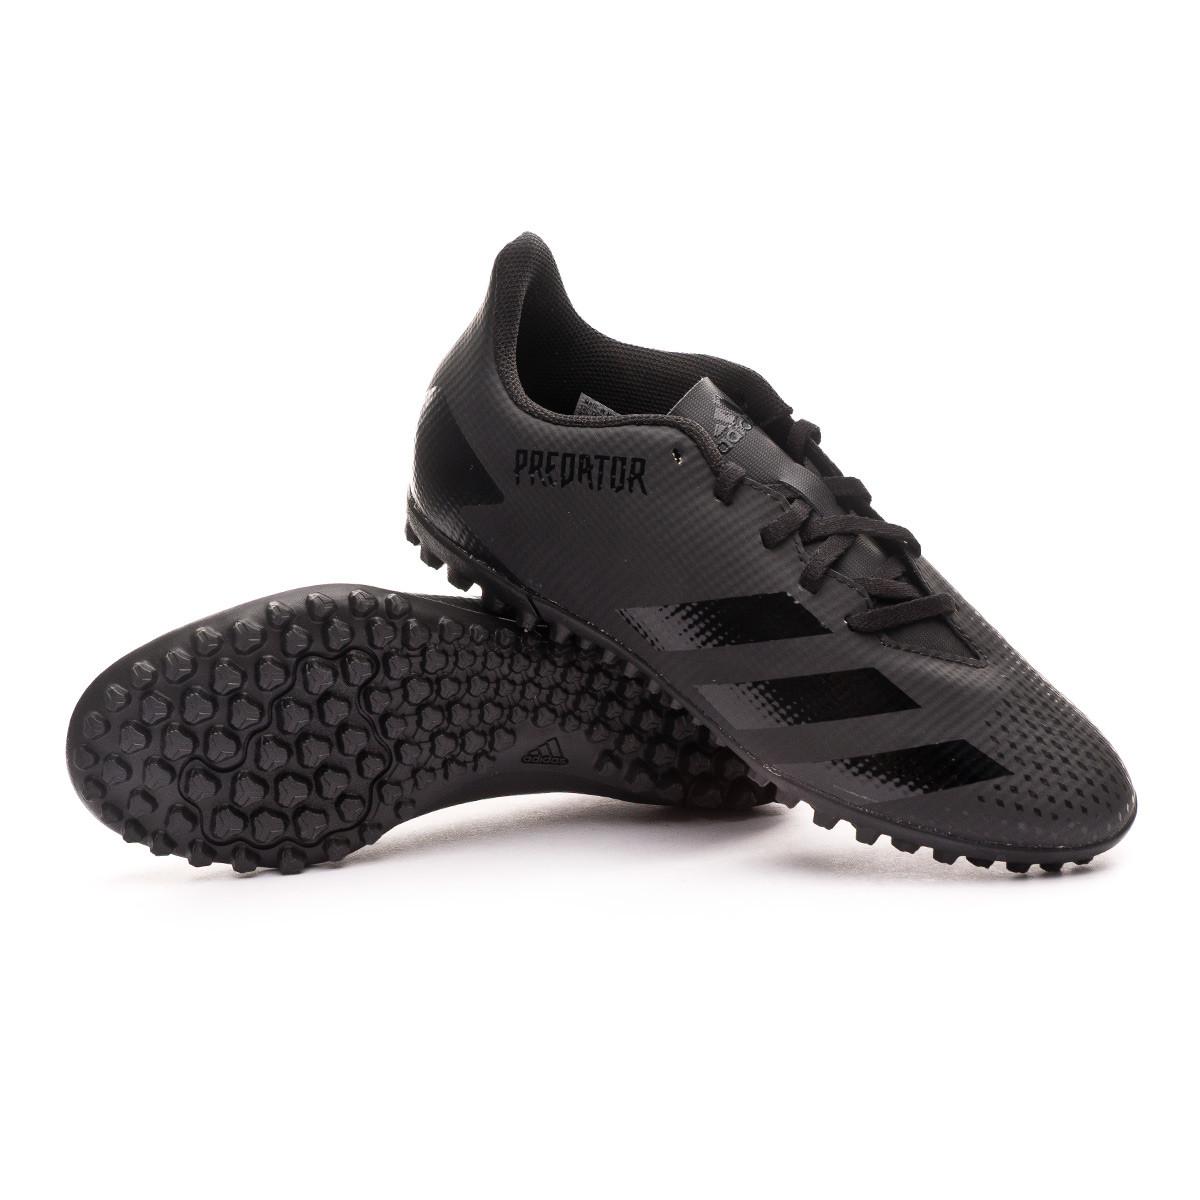 adidas Predator Mutator 20.1 Low SG Core Black White.